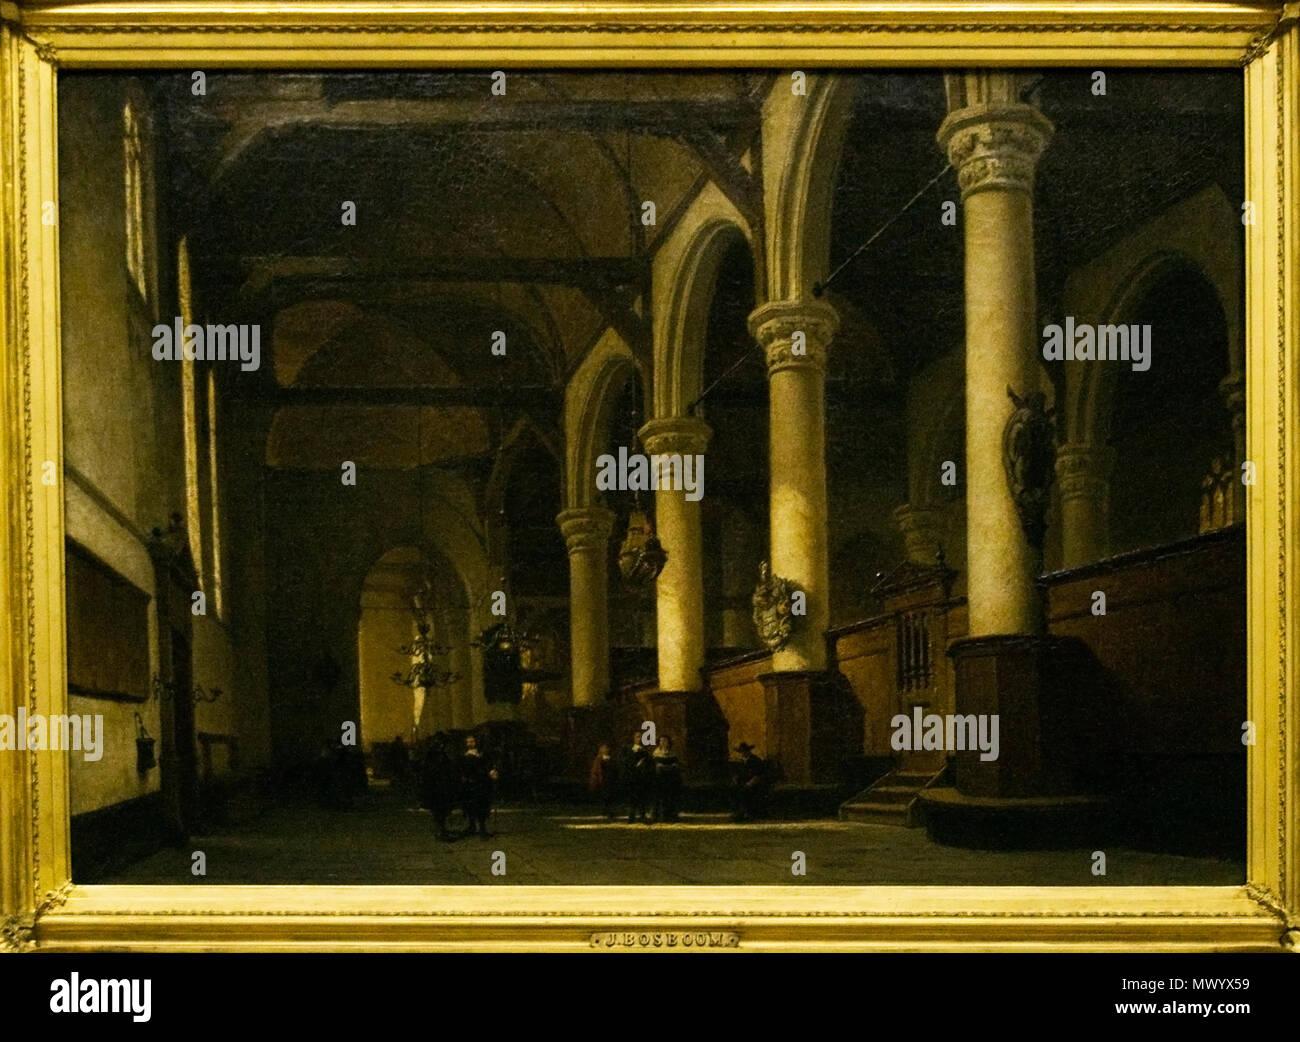 https://c8.alamy.com/comp/MWYX59/magyar-az-edami-templom-bels-kpe-nederlands-interieur-van-de-kerk-van-edam-299-interior-of-the-church-of-edam-MWYX59.jpg